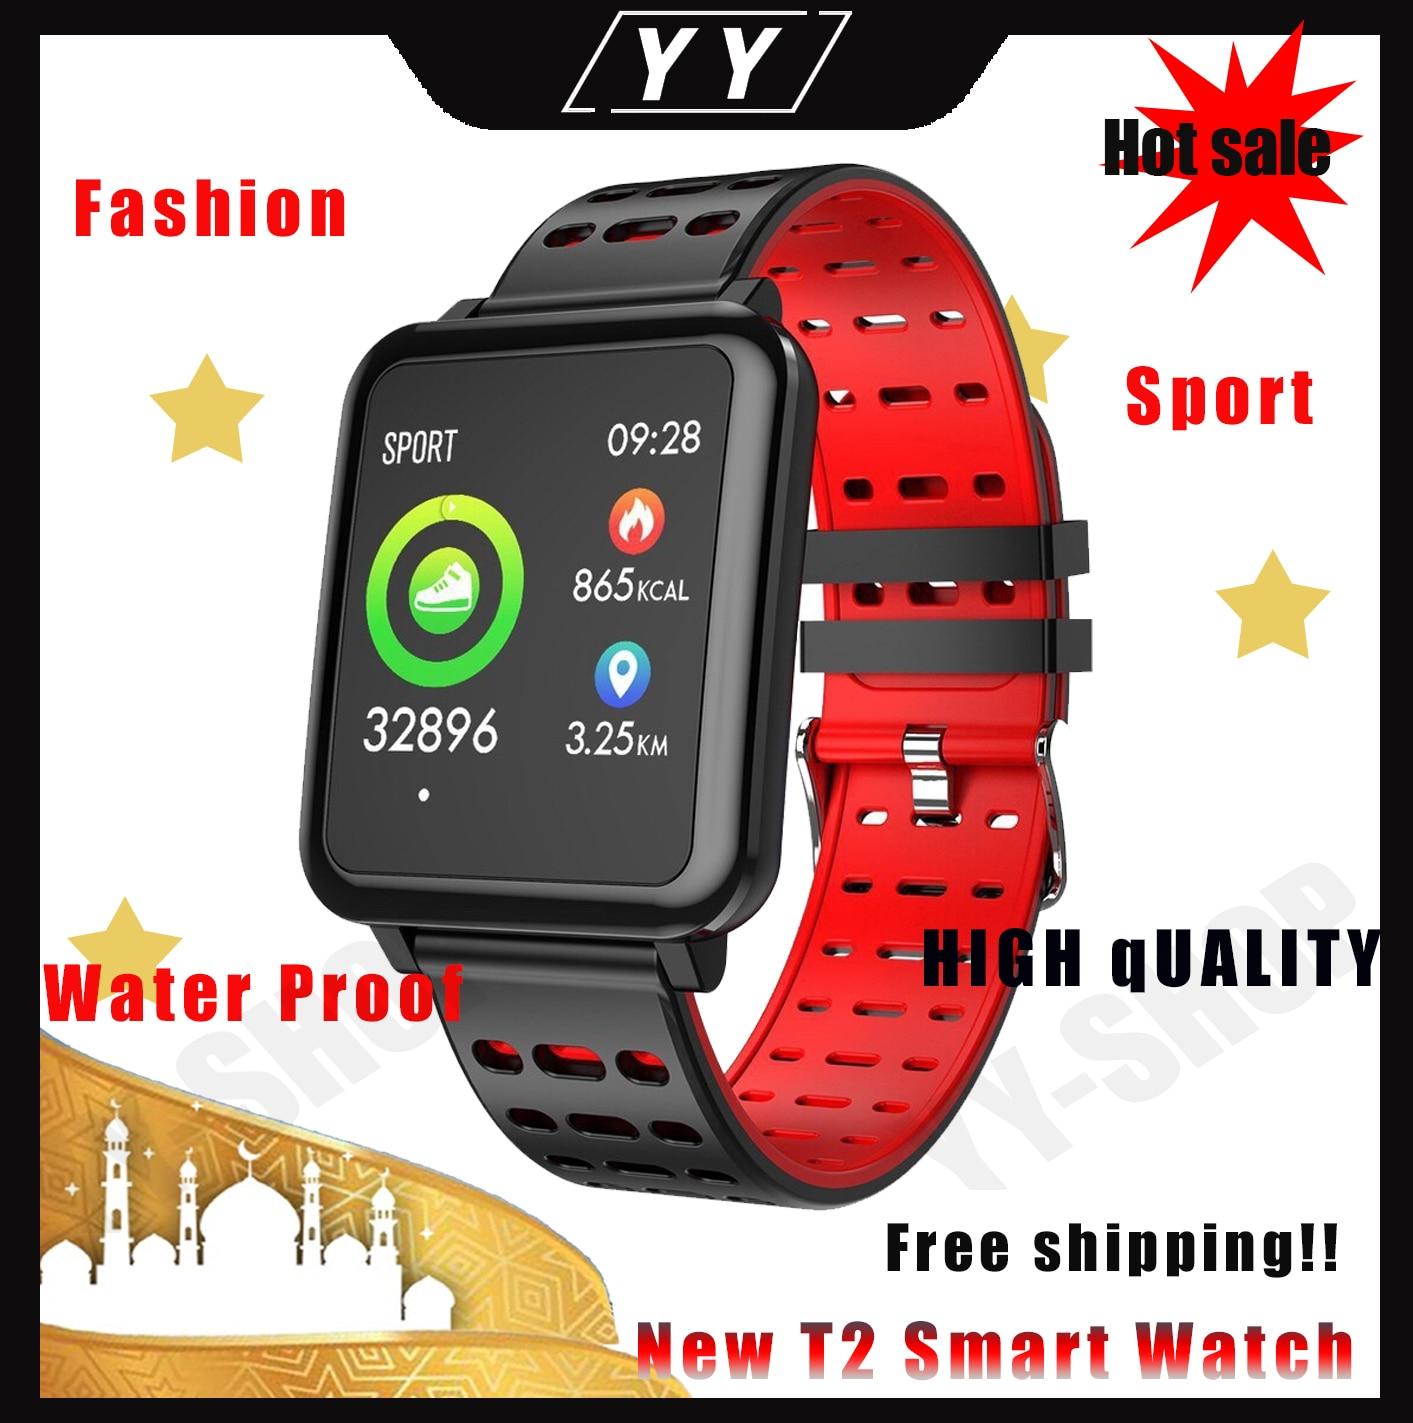 ¡Caliente! Reloj inteligente T2, podómetro, reloj inteligente, banda de frecuencia cardíaca, pantalla de presión arterial, pulsera impermeable para android ios, reloj apple